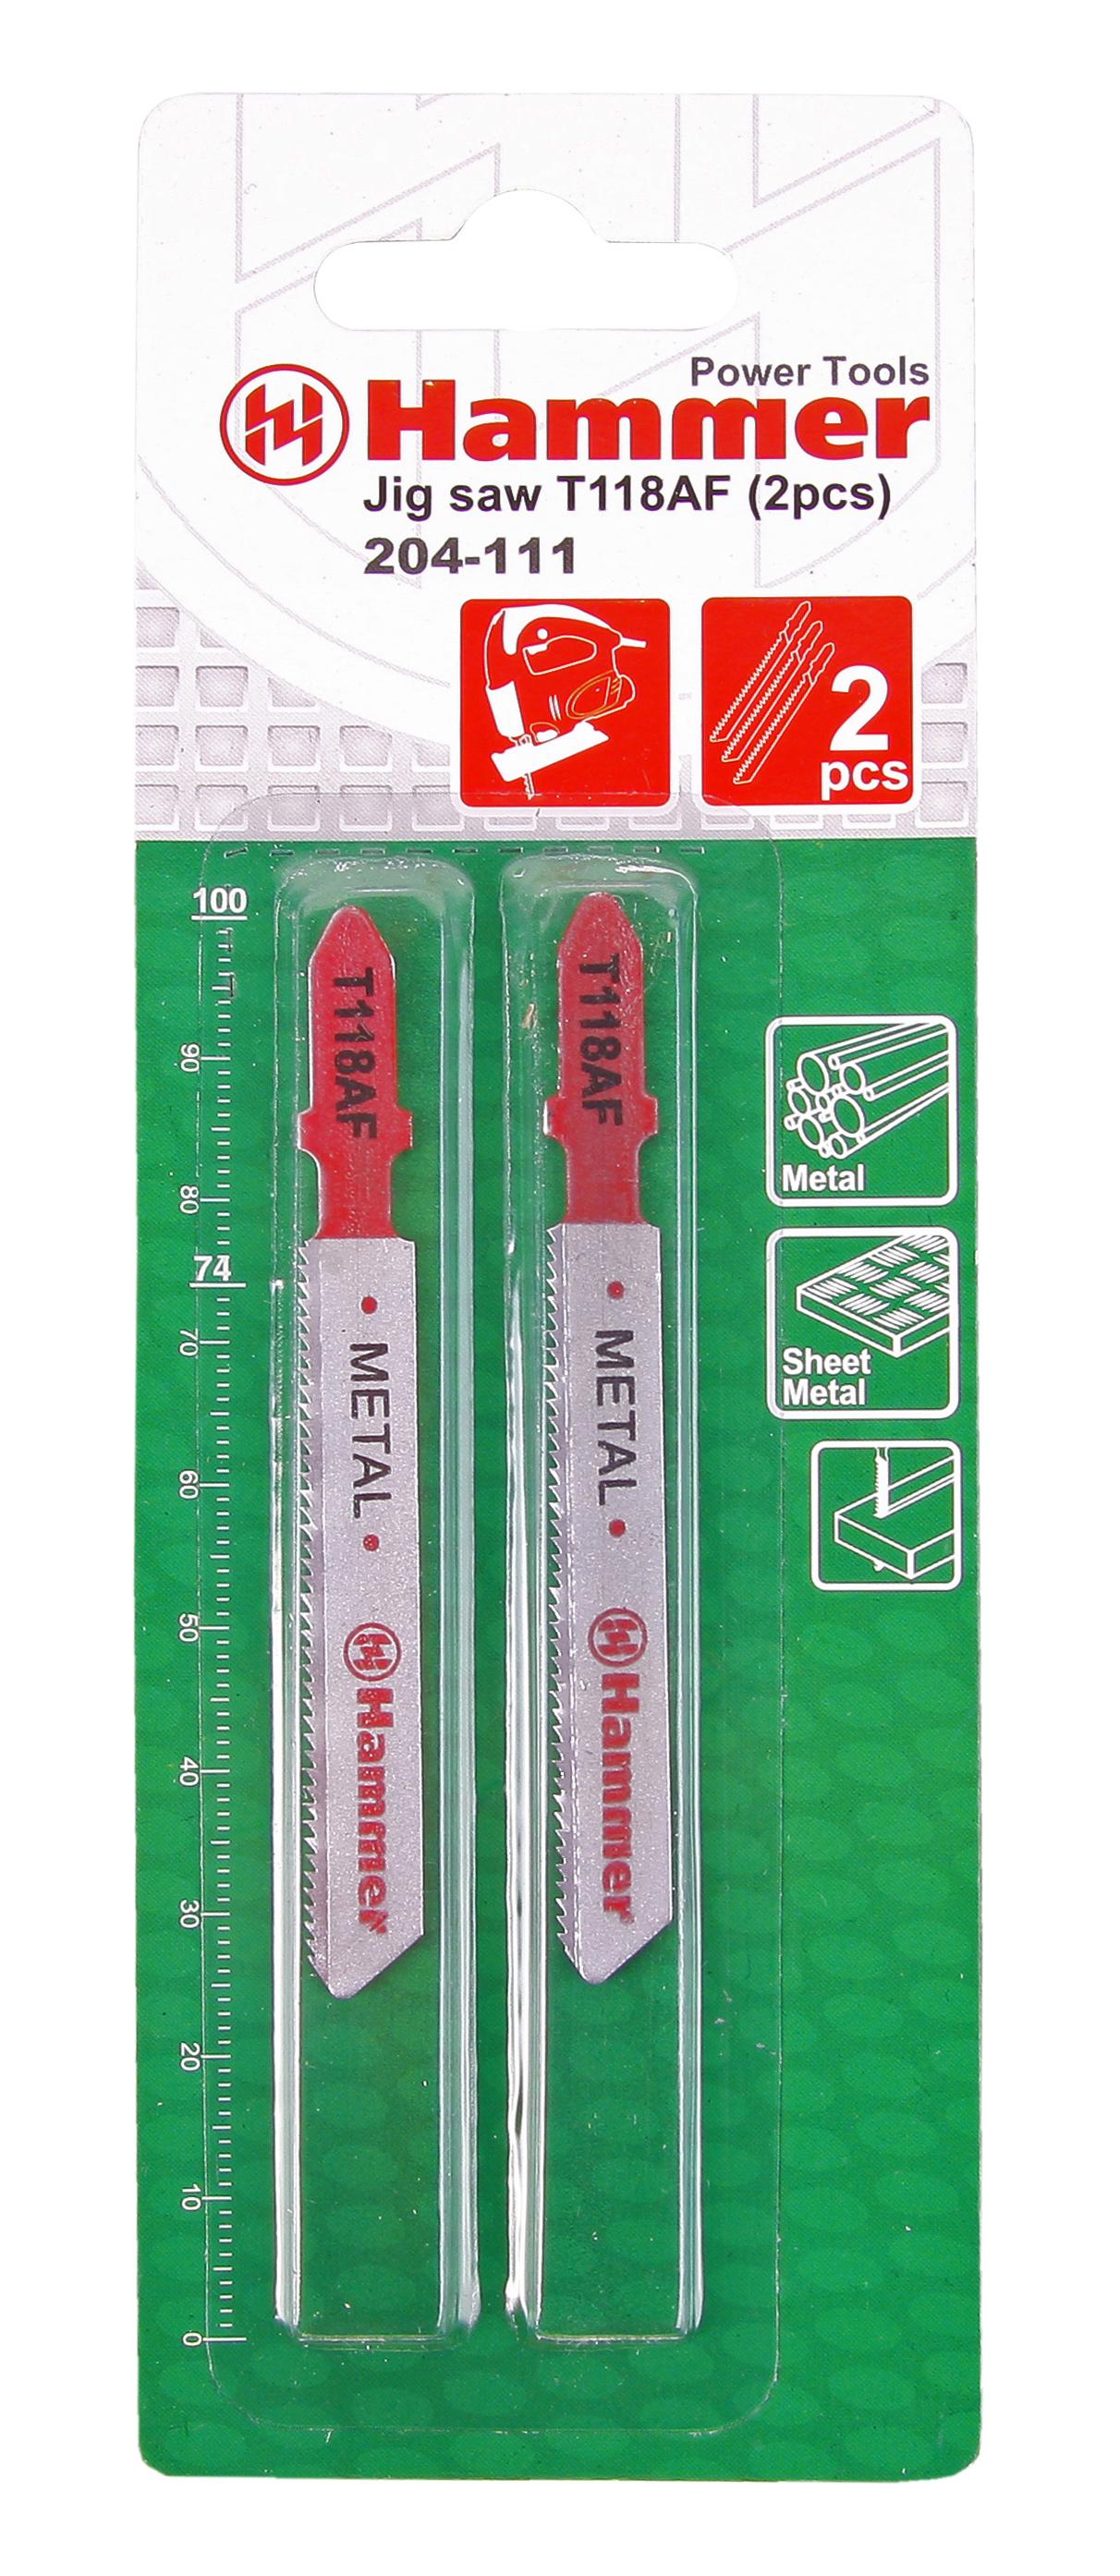 Пилки для лобзика Hammer Jg mt t118af (2шт.) фрезер hammer flex frz1200b